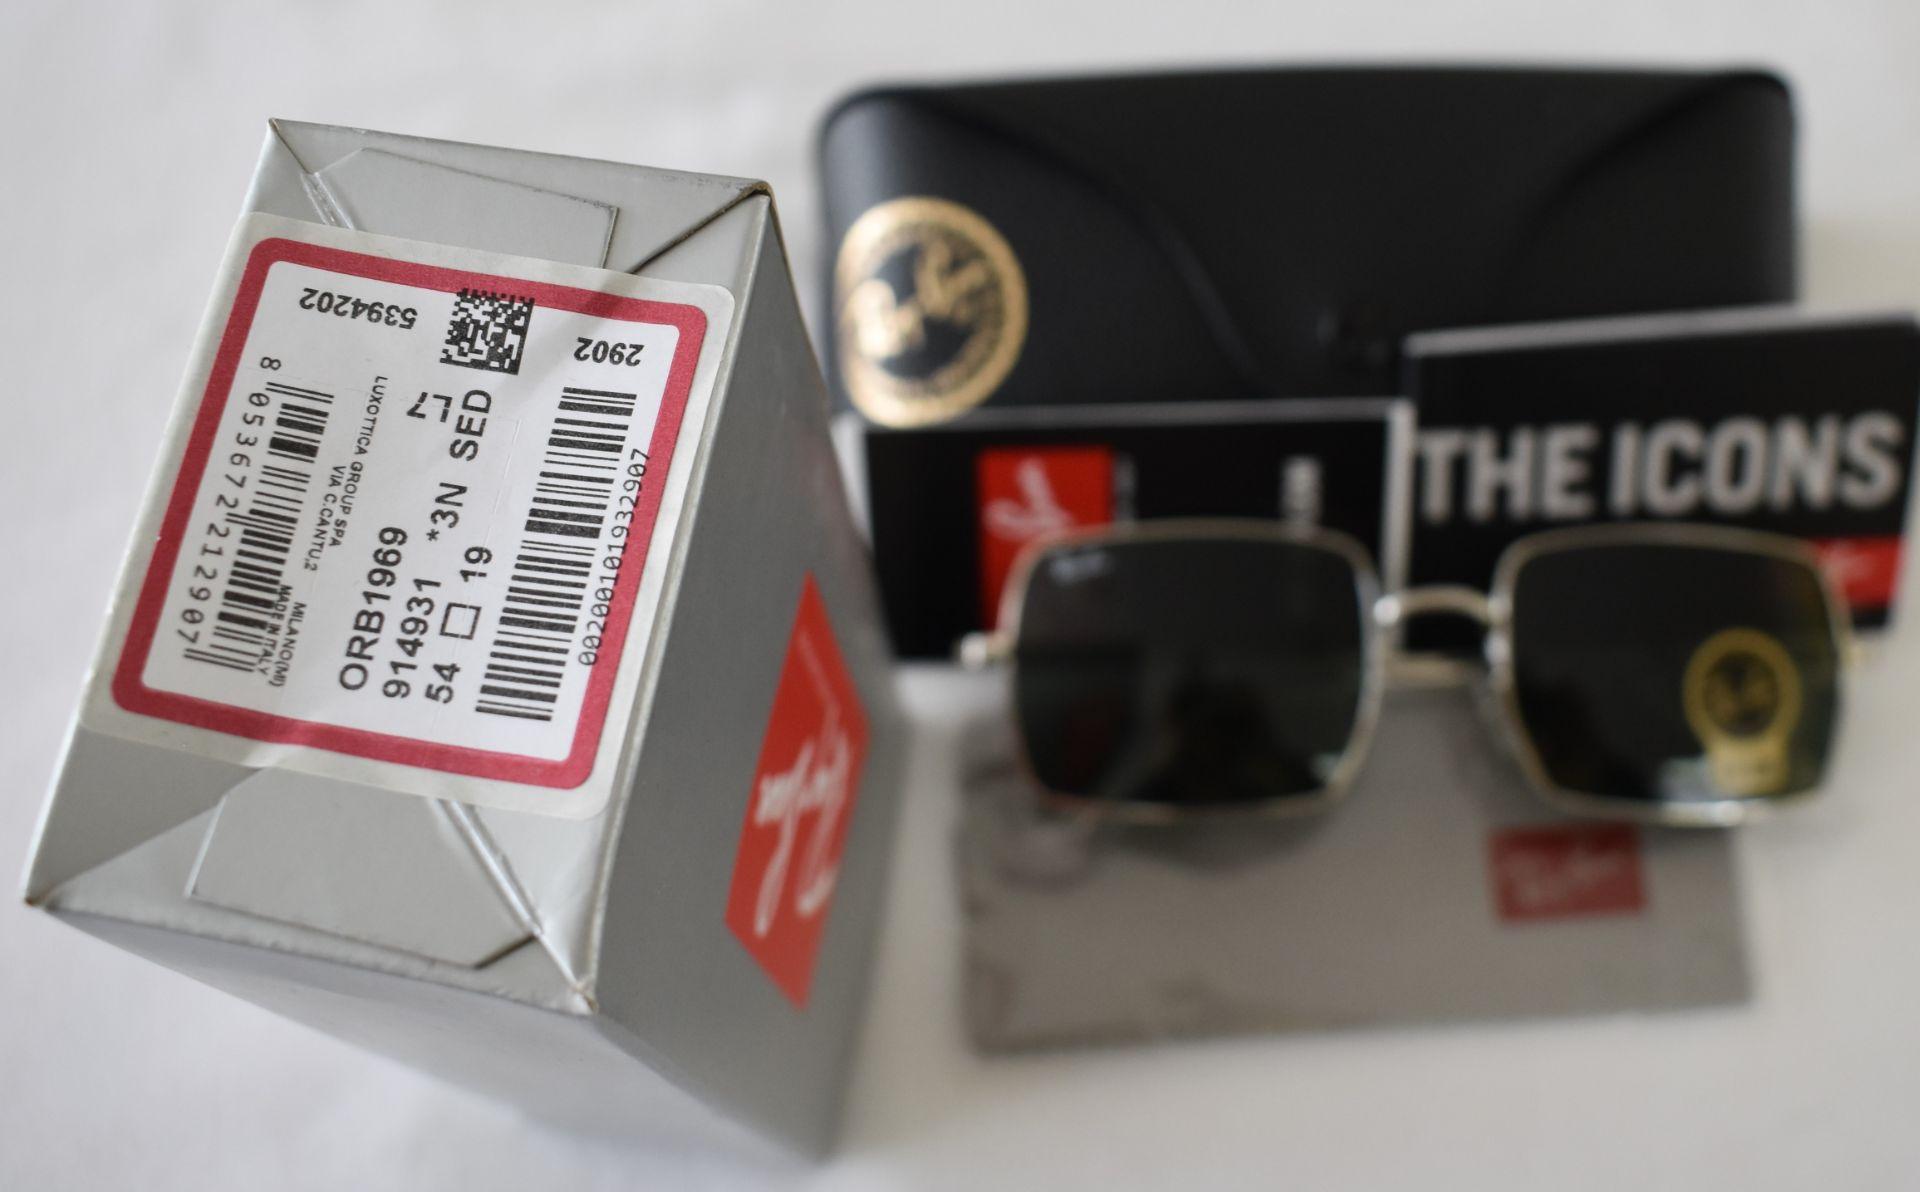 Ray Ban Sunglasses ORB1969 914931 *3N - Image 2 of 2